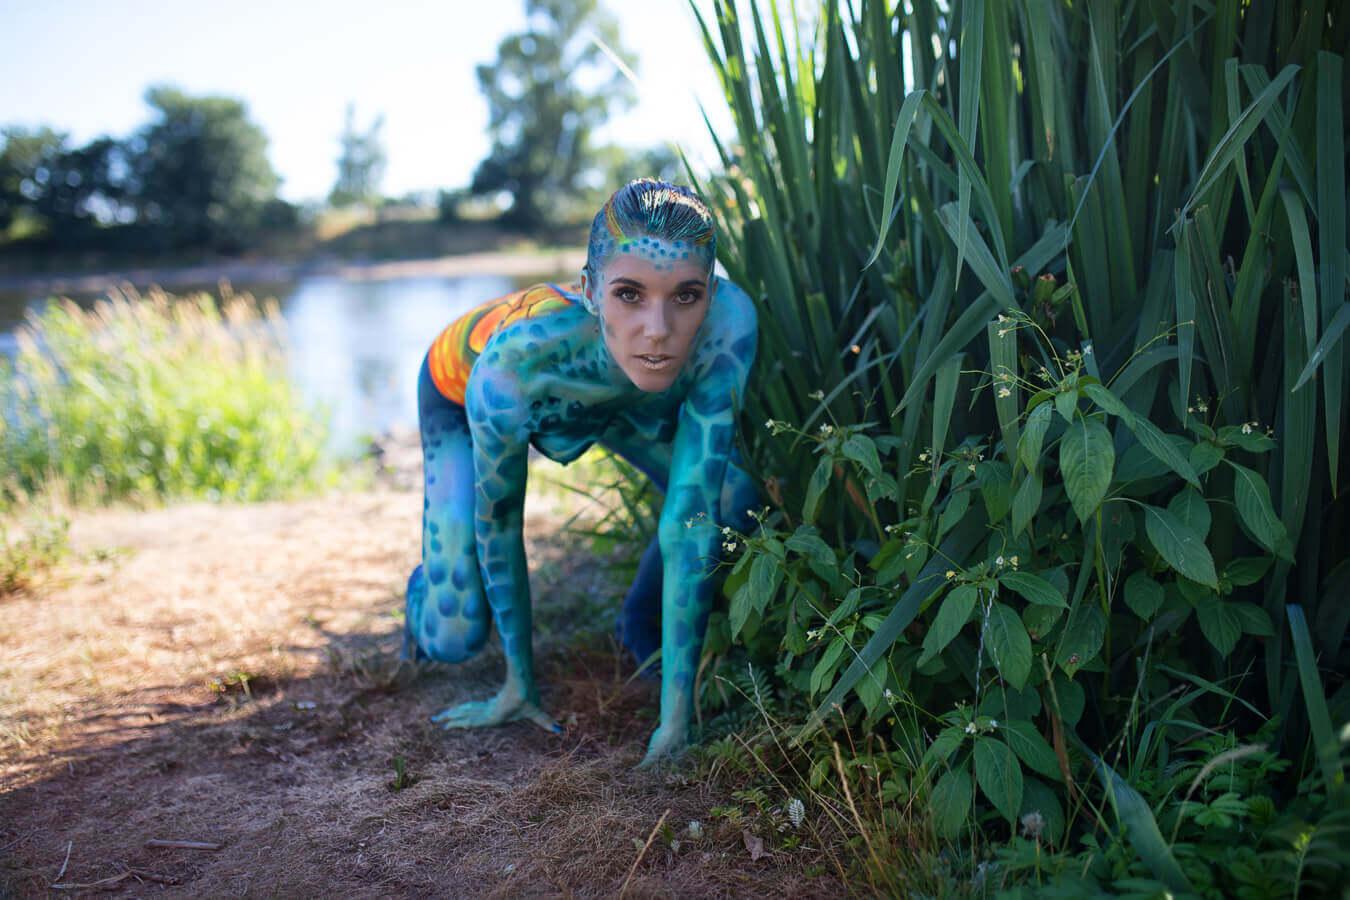 Fotograf-Fotostudio-Dresden-Painting-Body-Natur-Wasser-Kunst-Farbe-Colourful-Styling-Make up